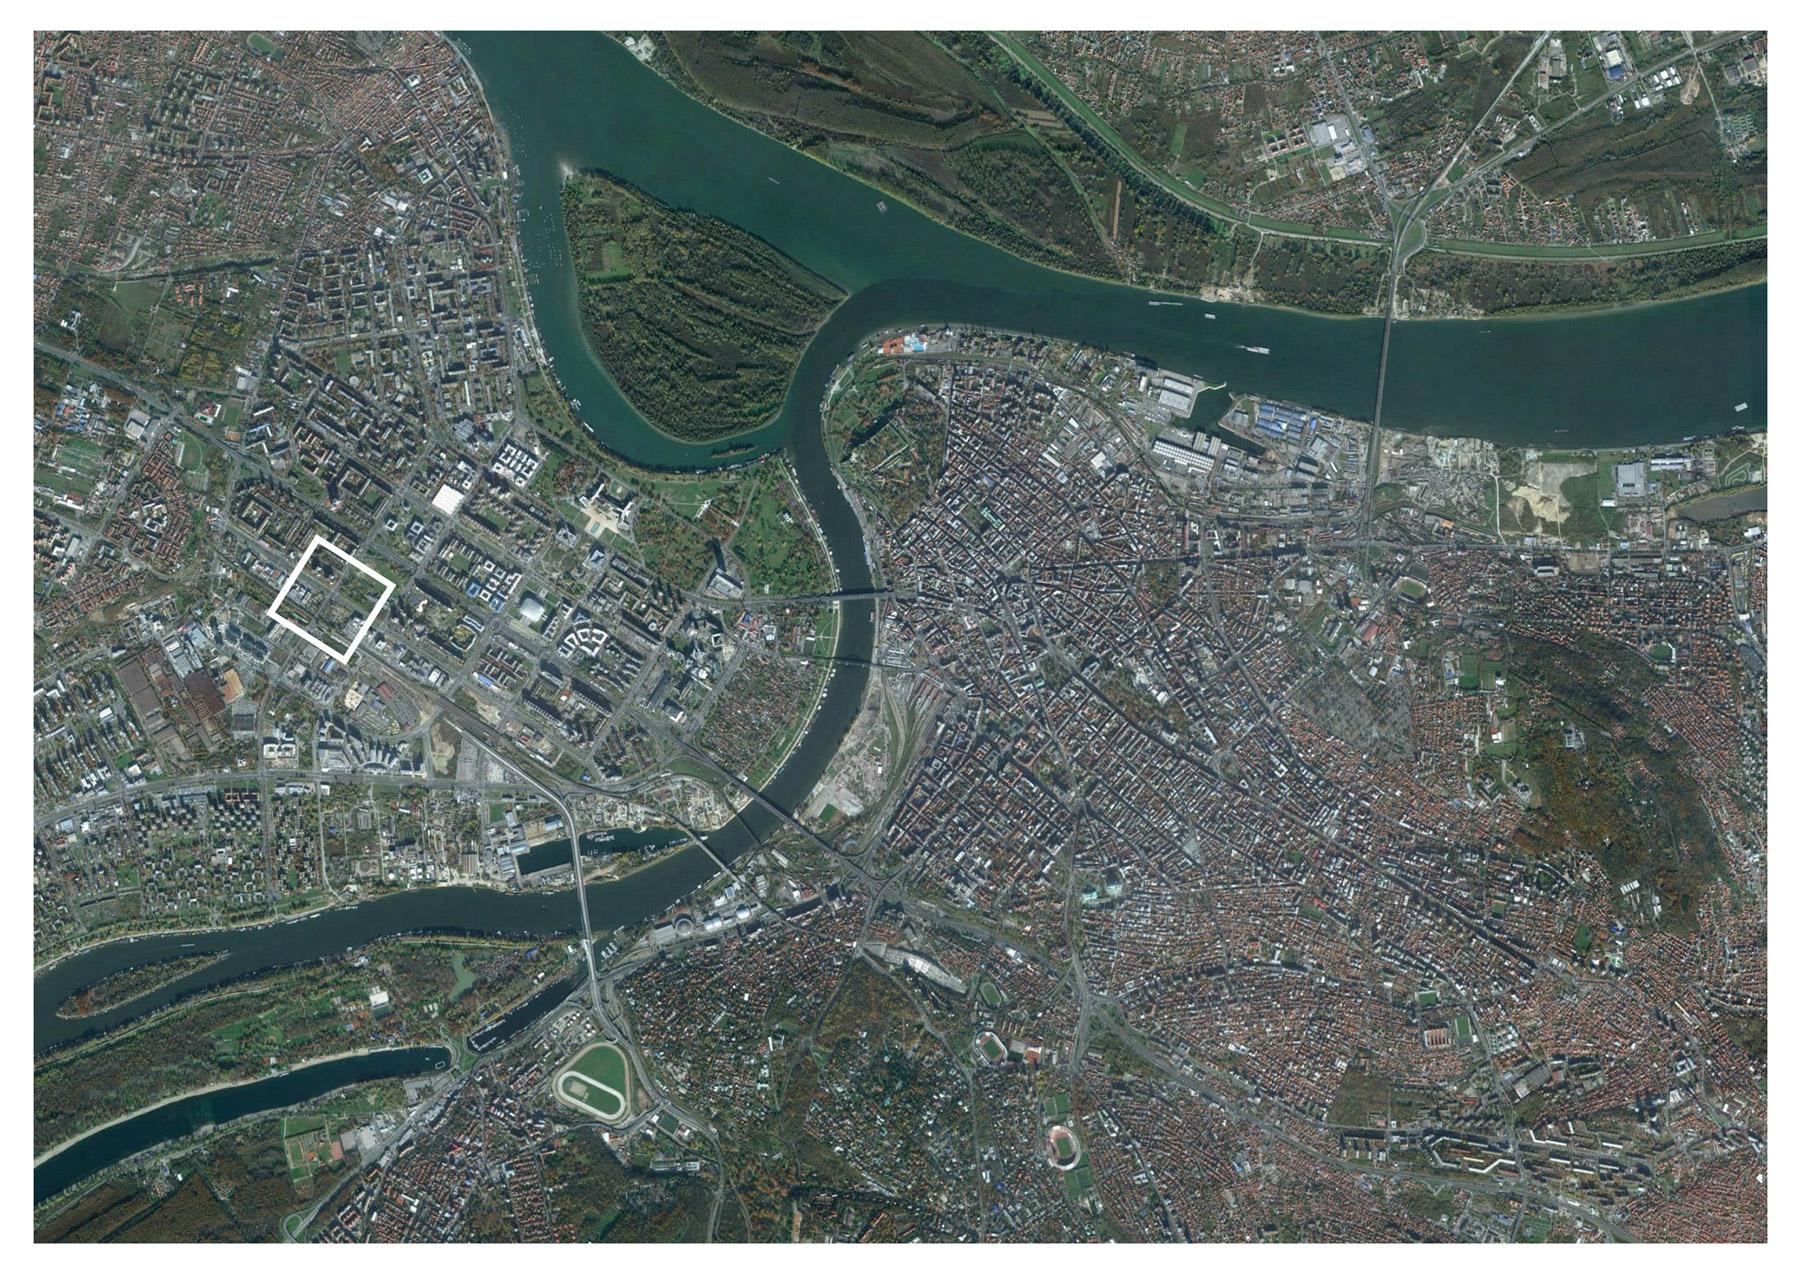 286_GTC_Belgrade_Green_Heart_slide_03